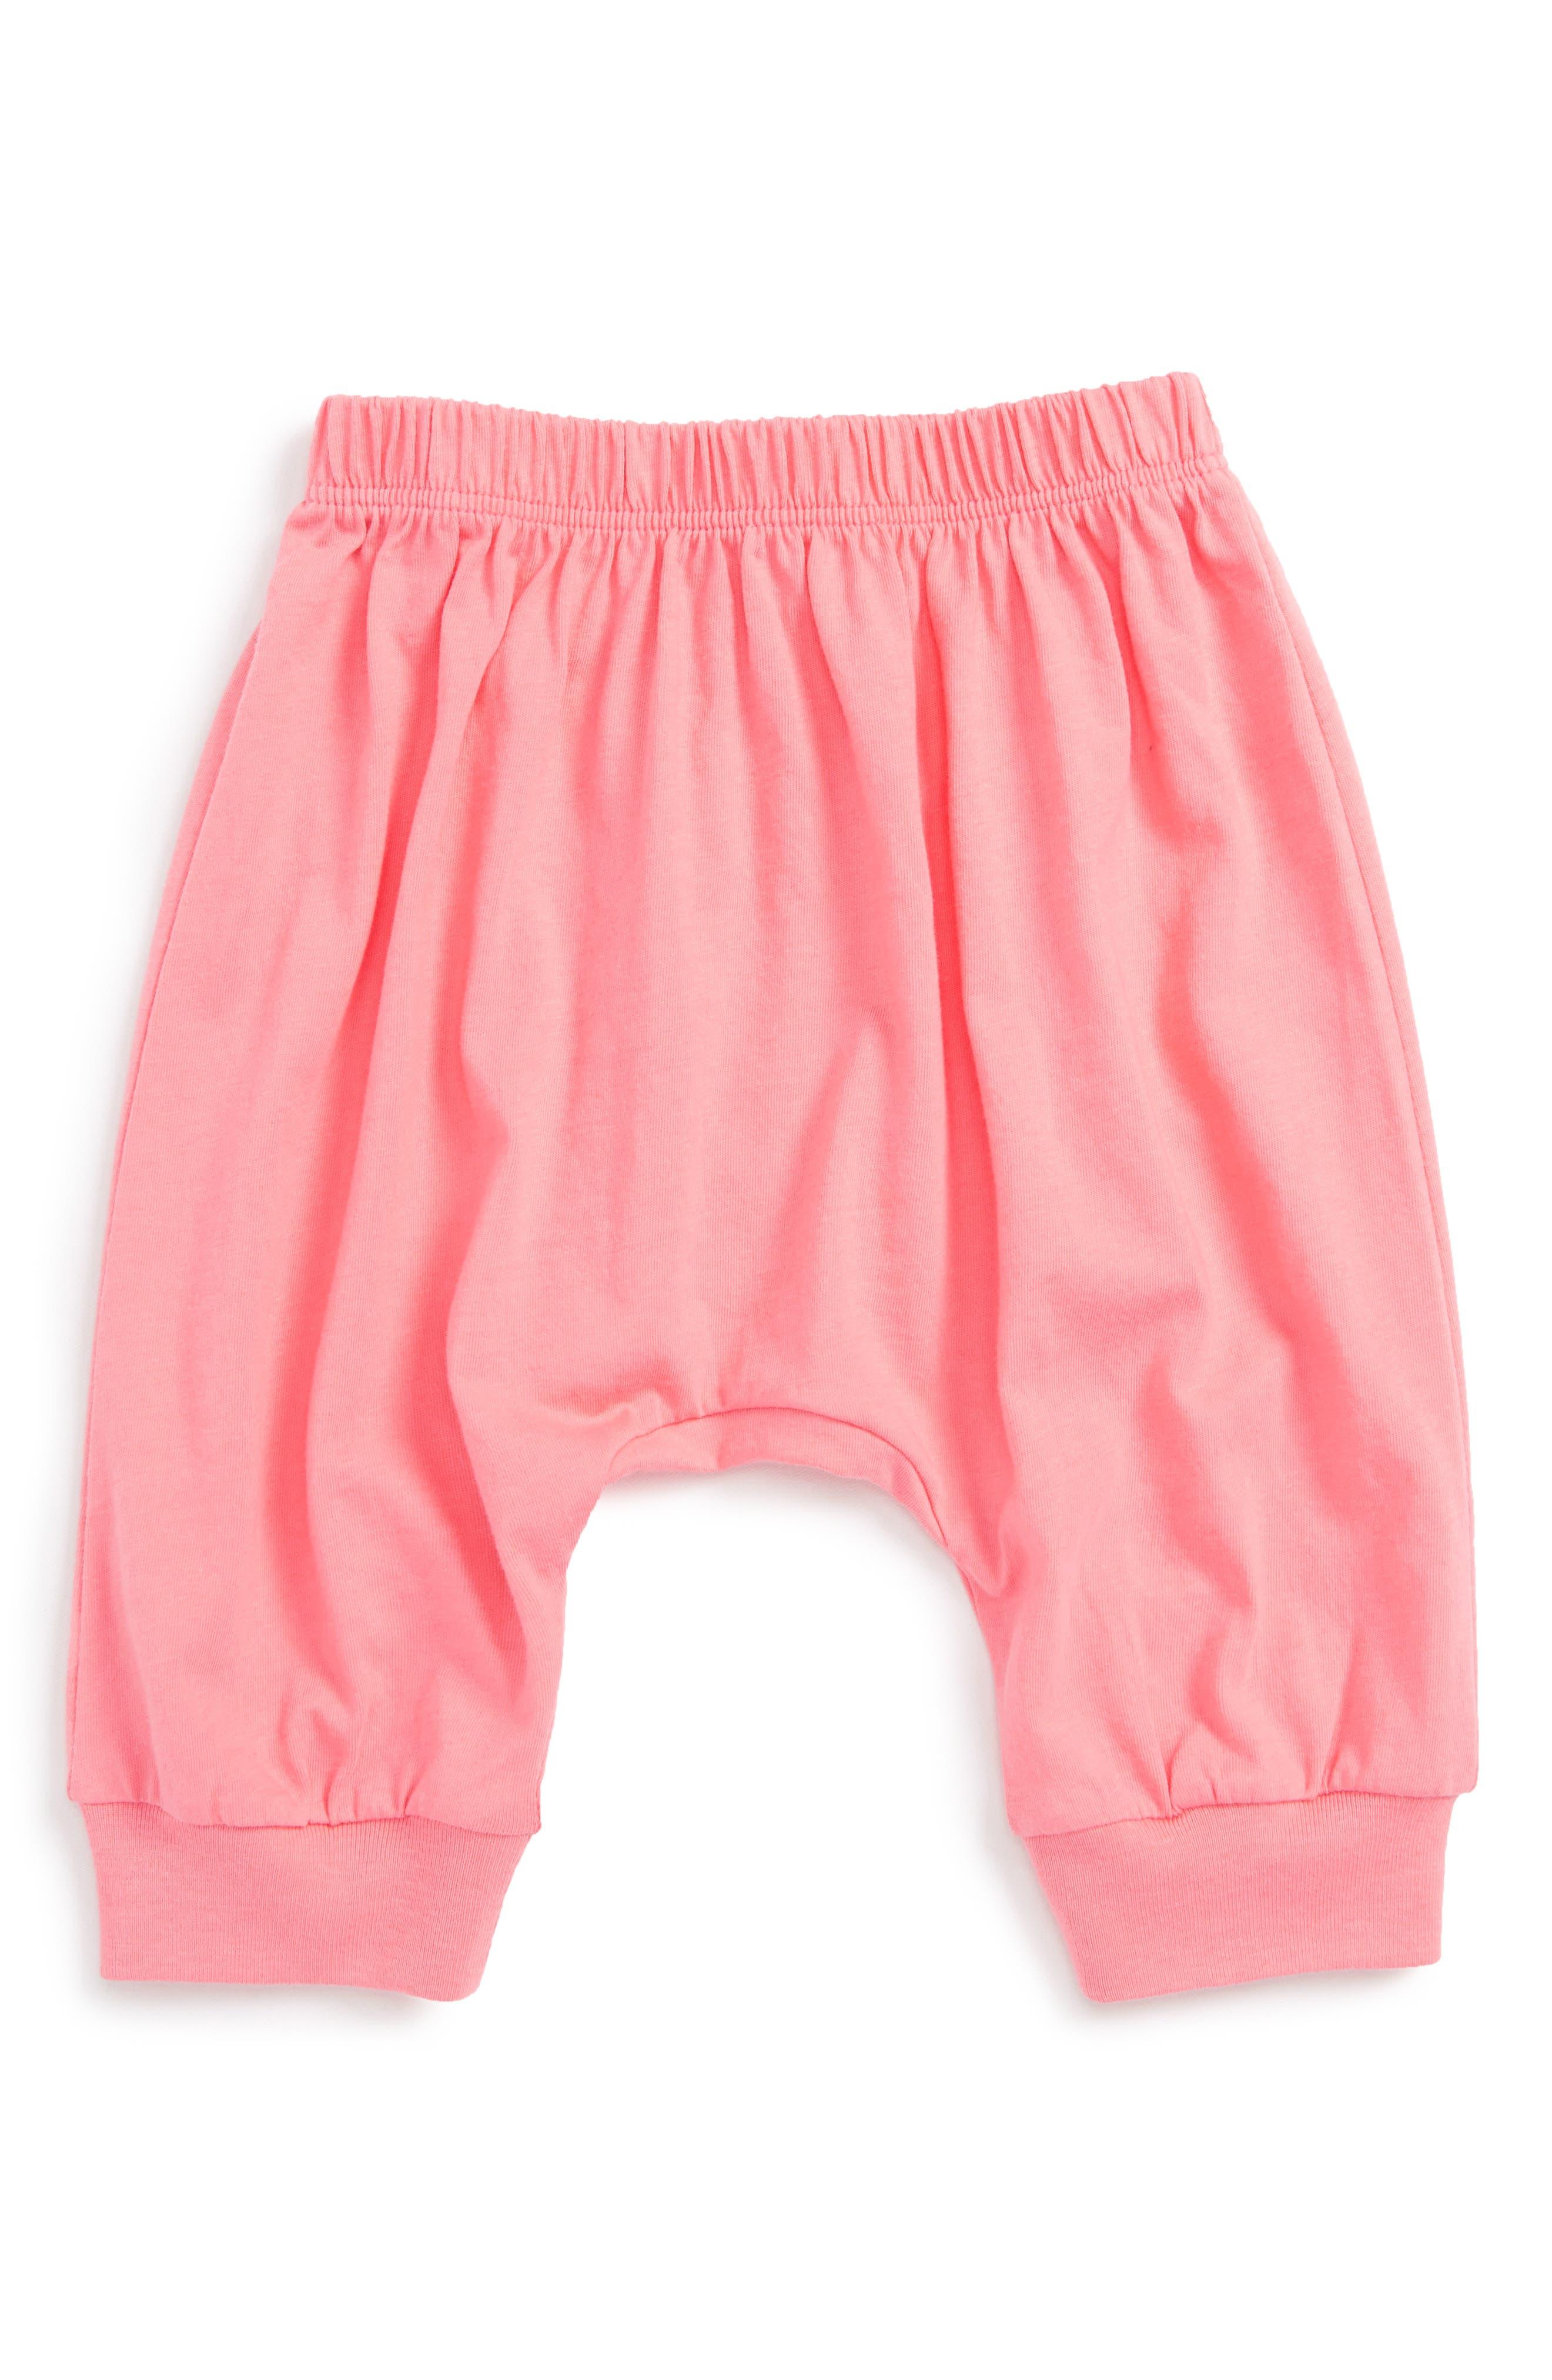 PEEK ESSENTIALS Peek Little Peanut - Happy Pants